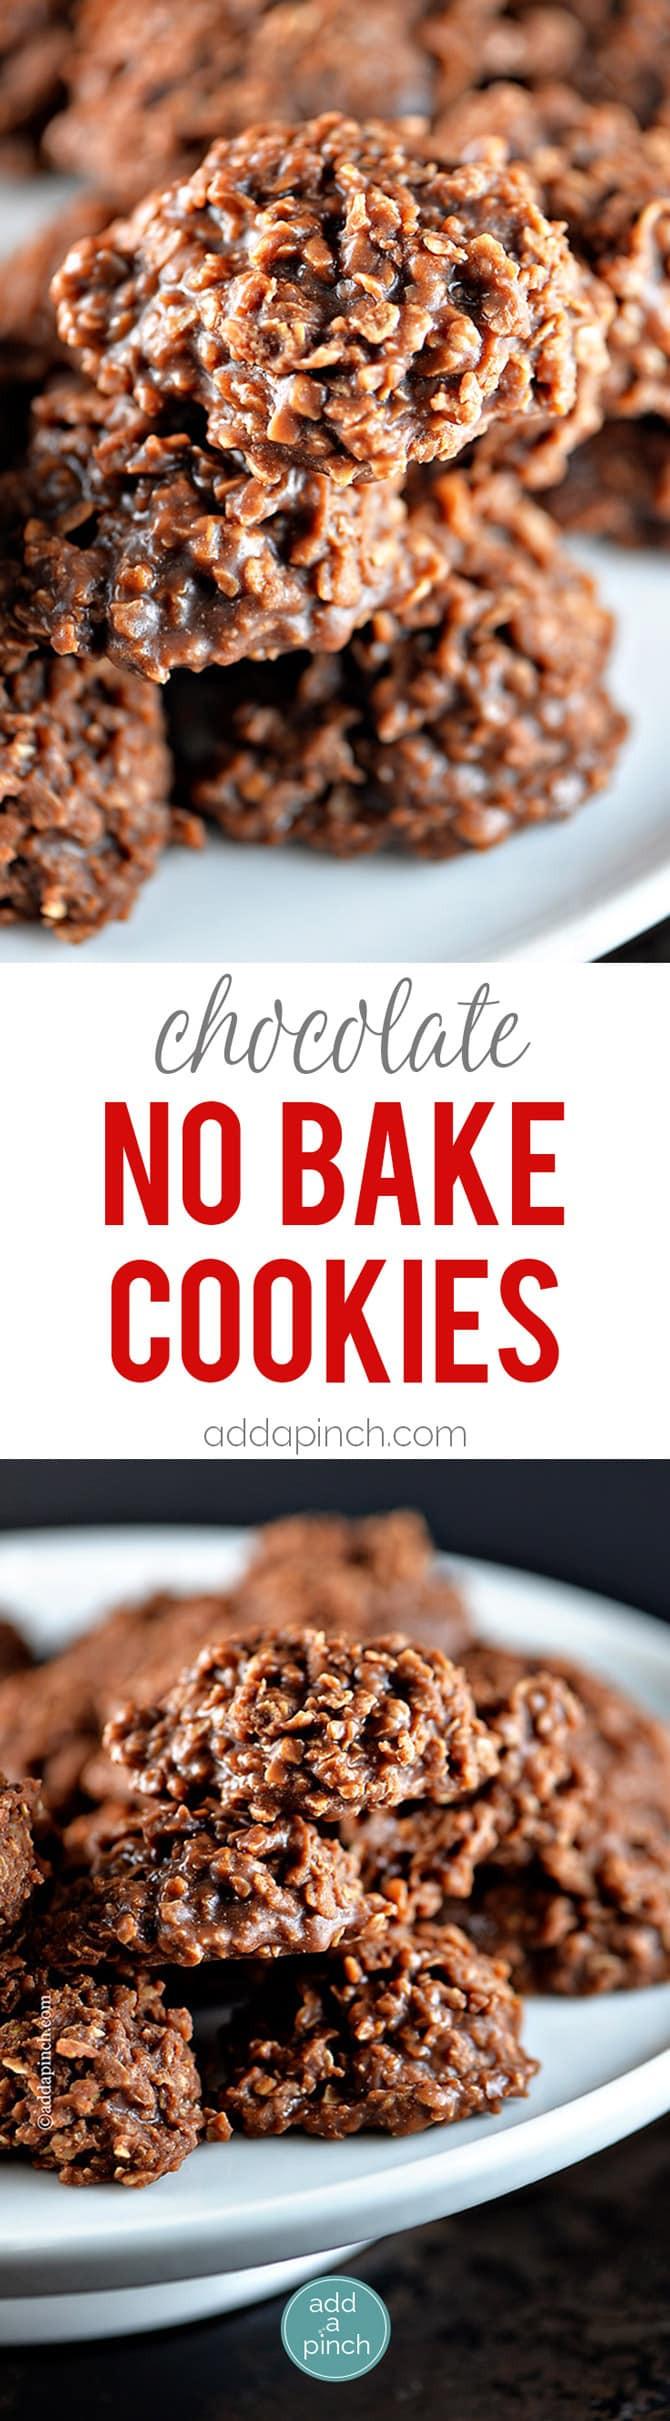 No Bake Cookies Recipes  Chocolate No Bake Cookies Recipe Add a Pinch